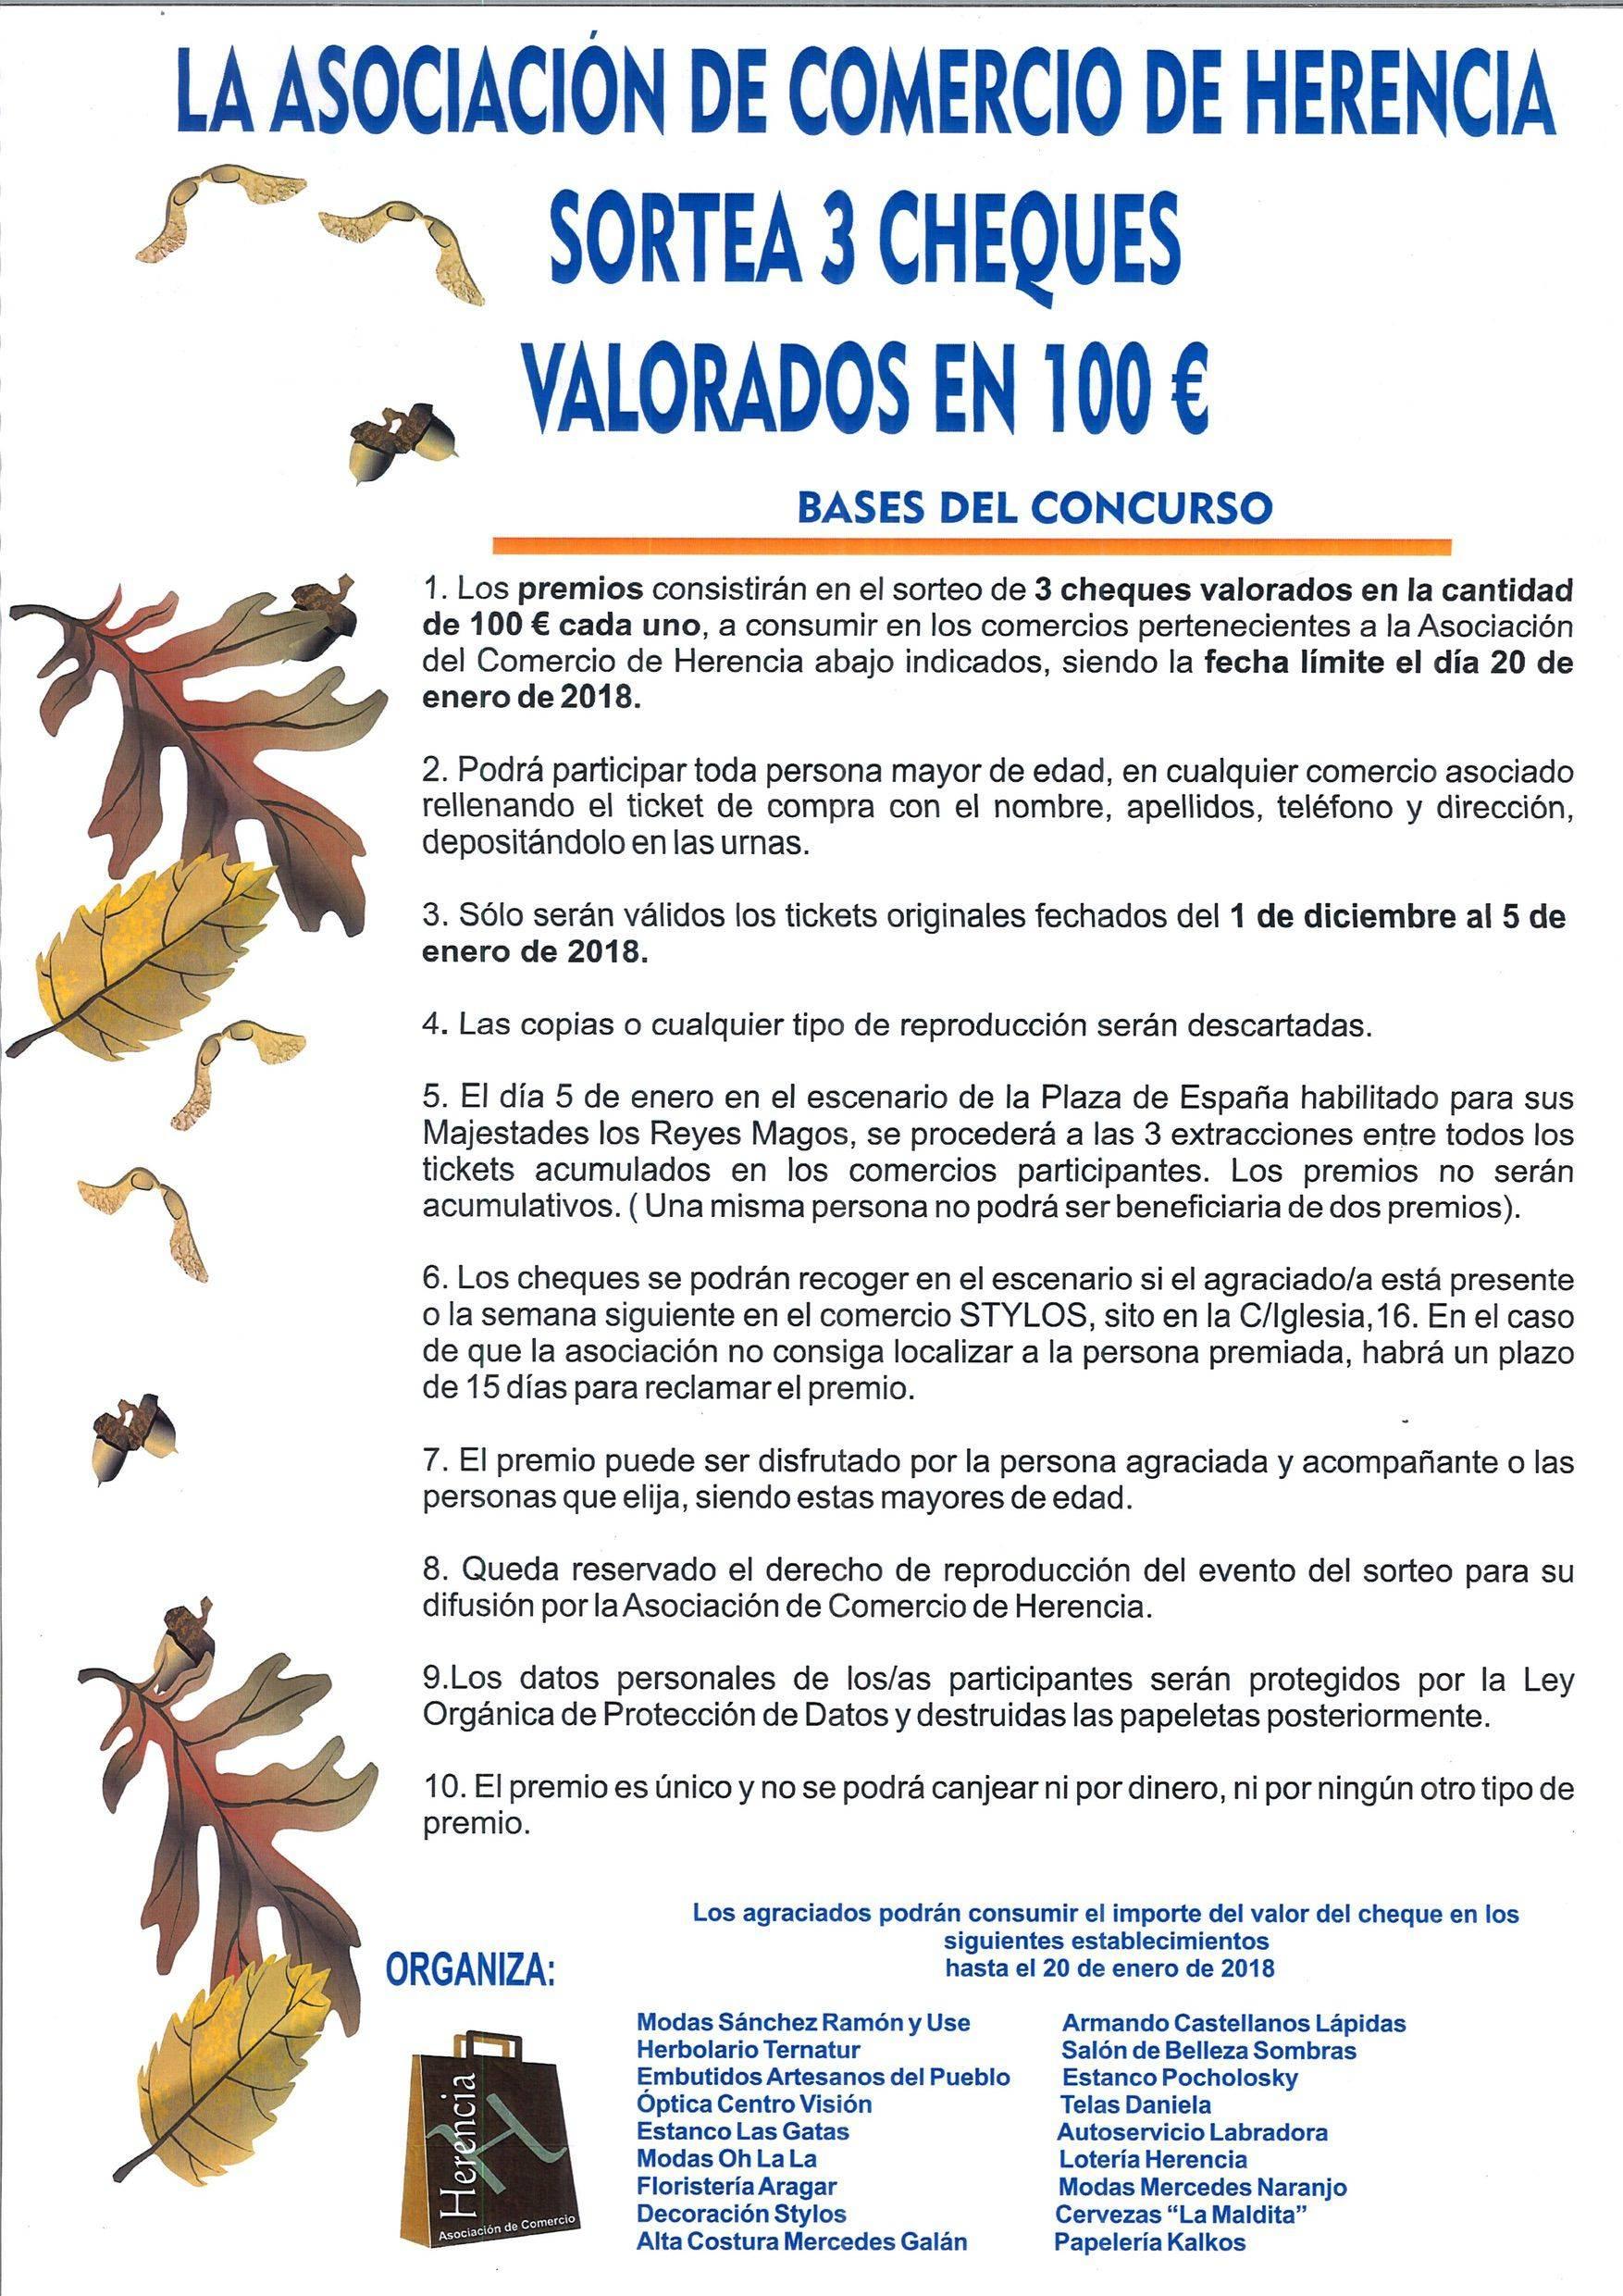 La Asociación de Comercio de Herencia sortea cheques valorados en 100 euros 3